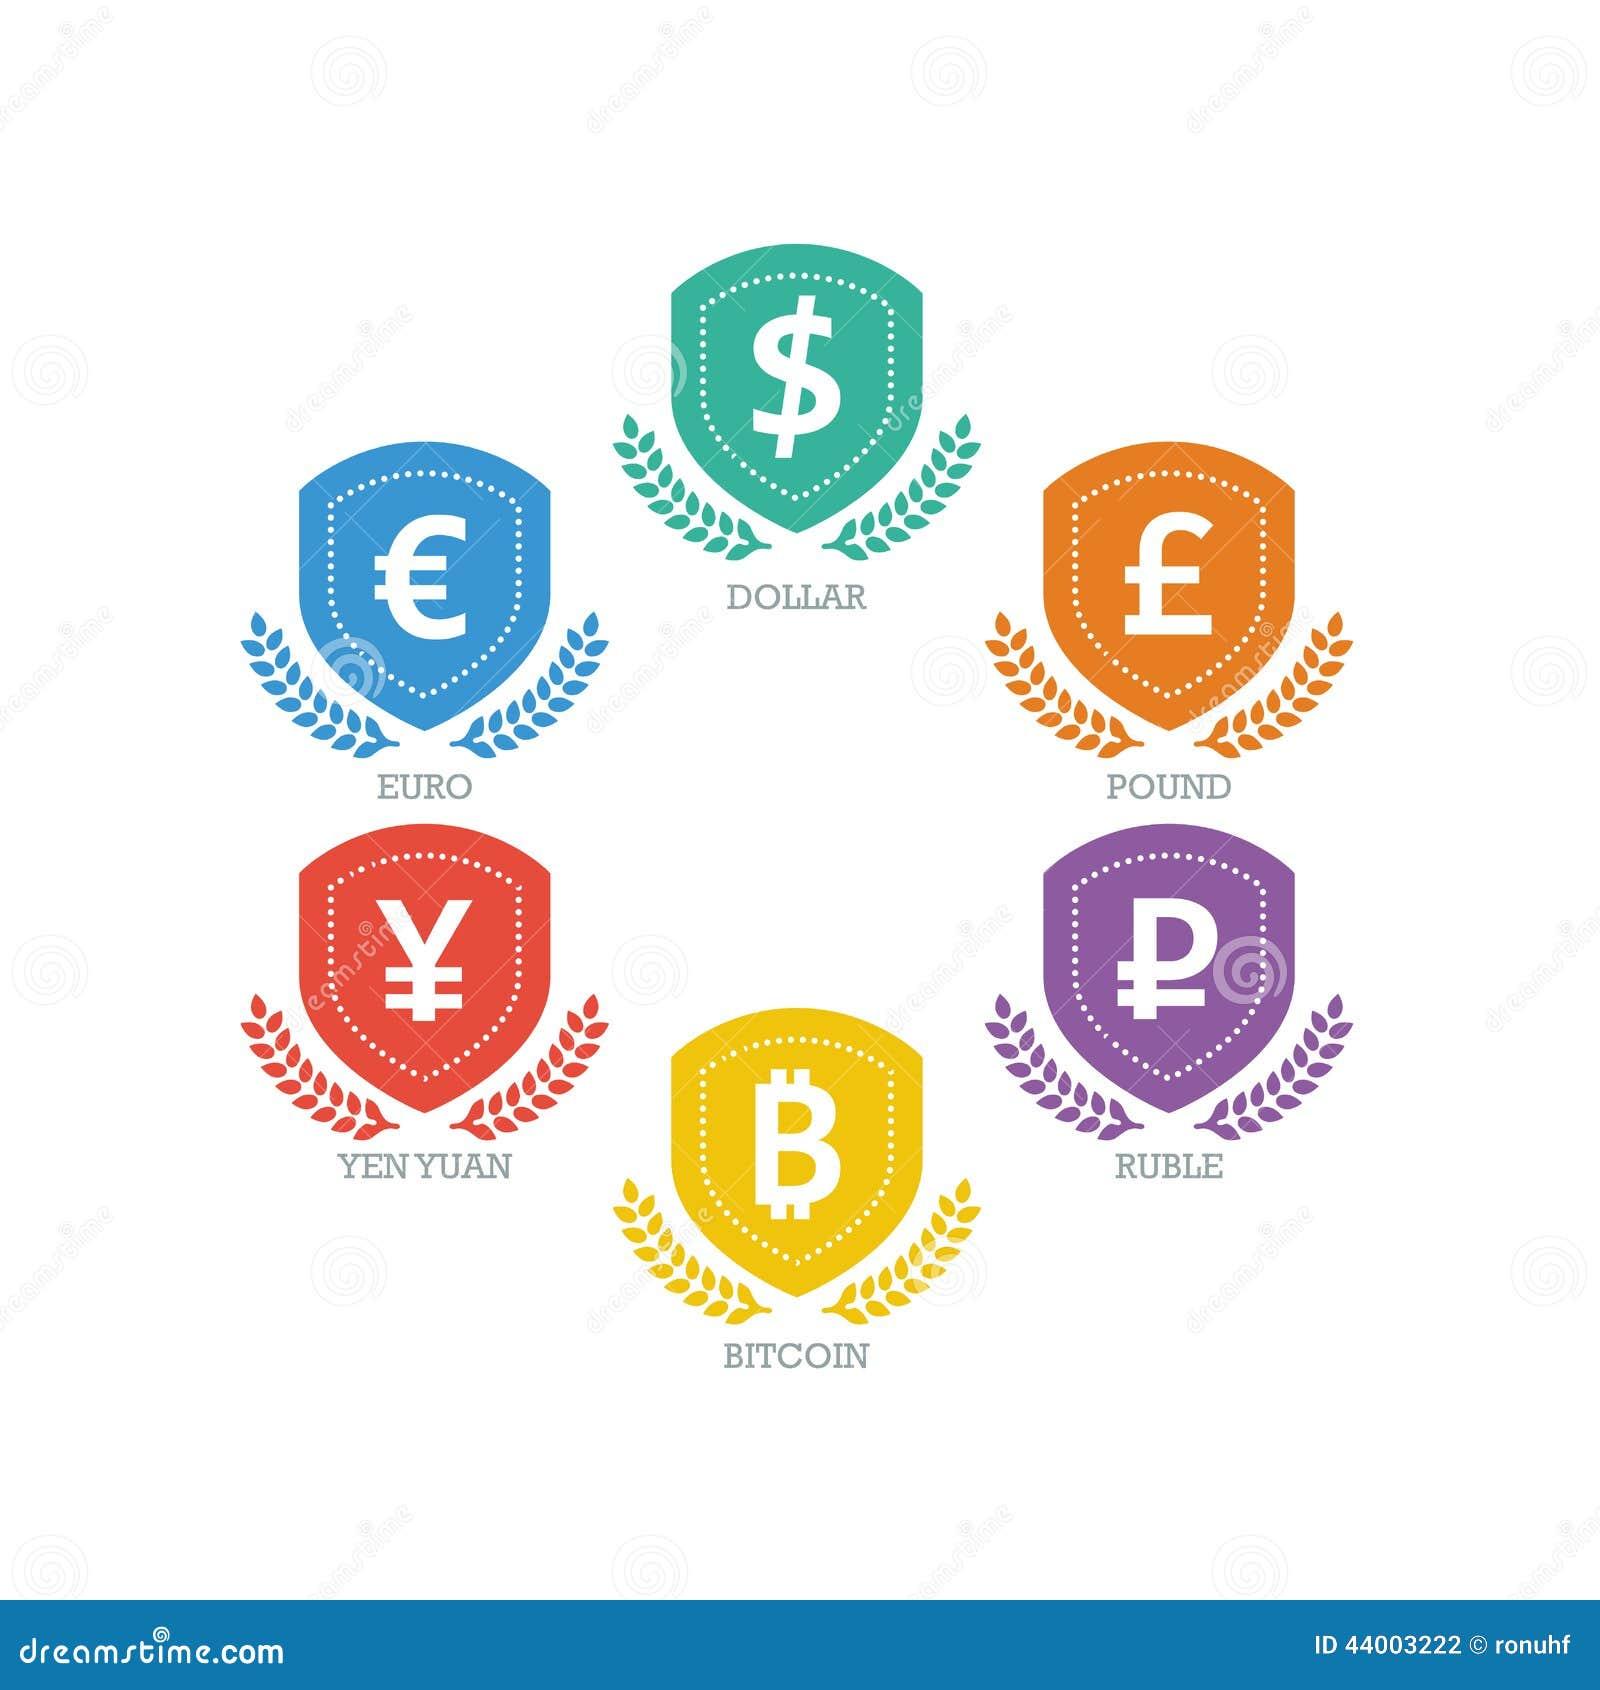 Euro dollar yen yuan bitcoin ruble pound mainstream currencies euro dollar yen yuan bitcoin ruble pound mainstream currencies symbols on shield sign concept currency buycottarizona Choice Image